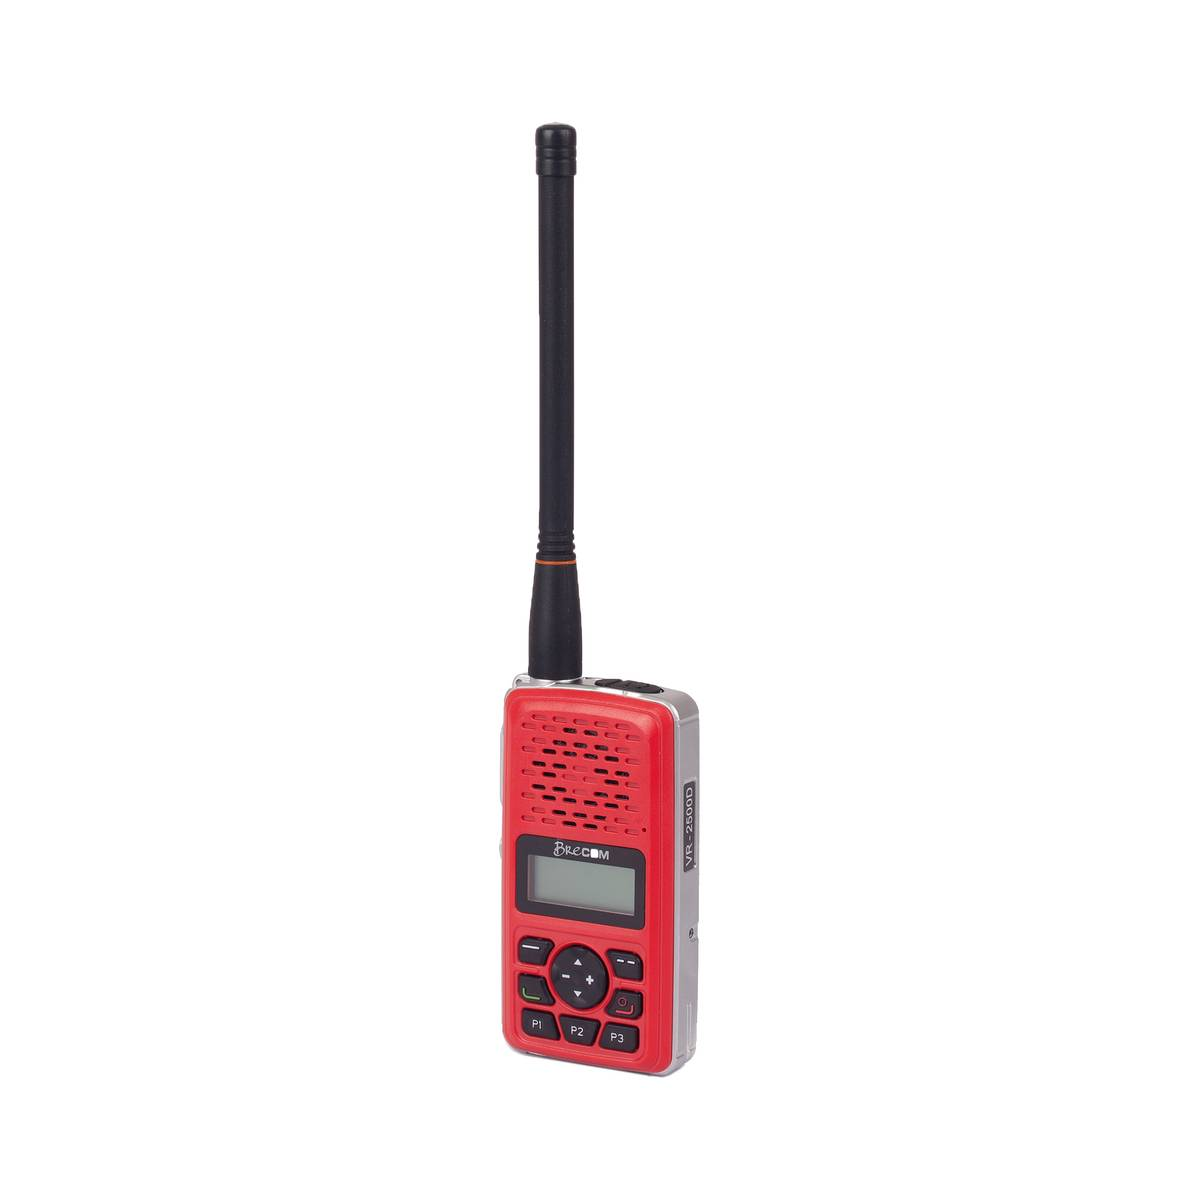 Brecom VR-2500 analog/digital radio DMR 138-174Mhz